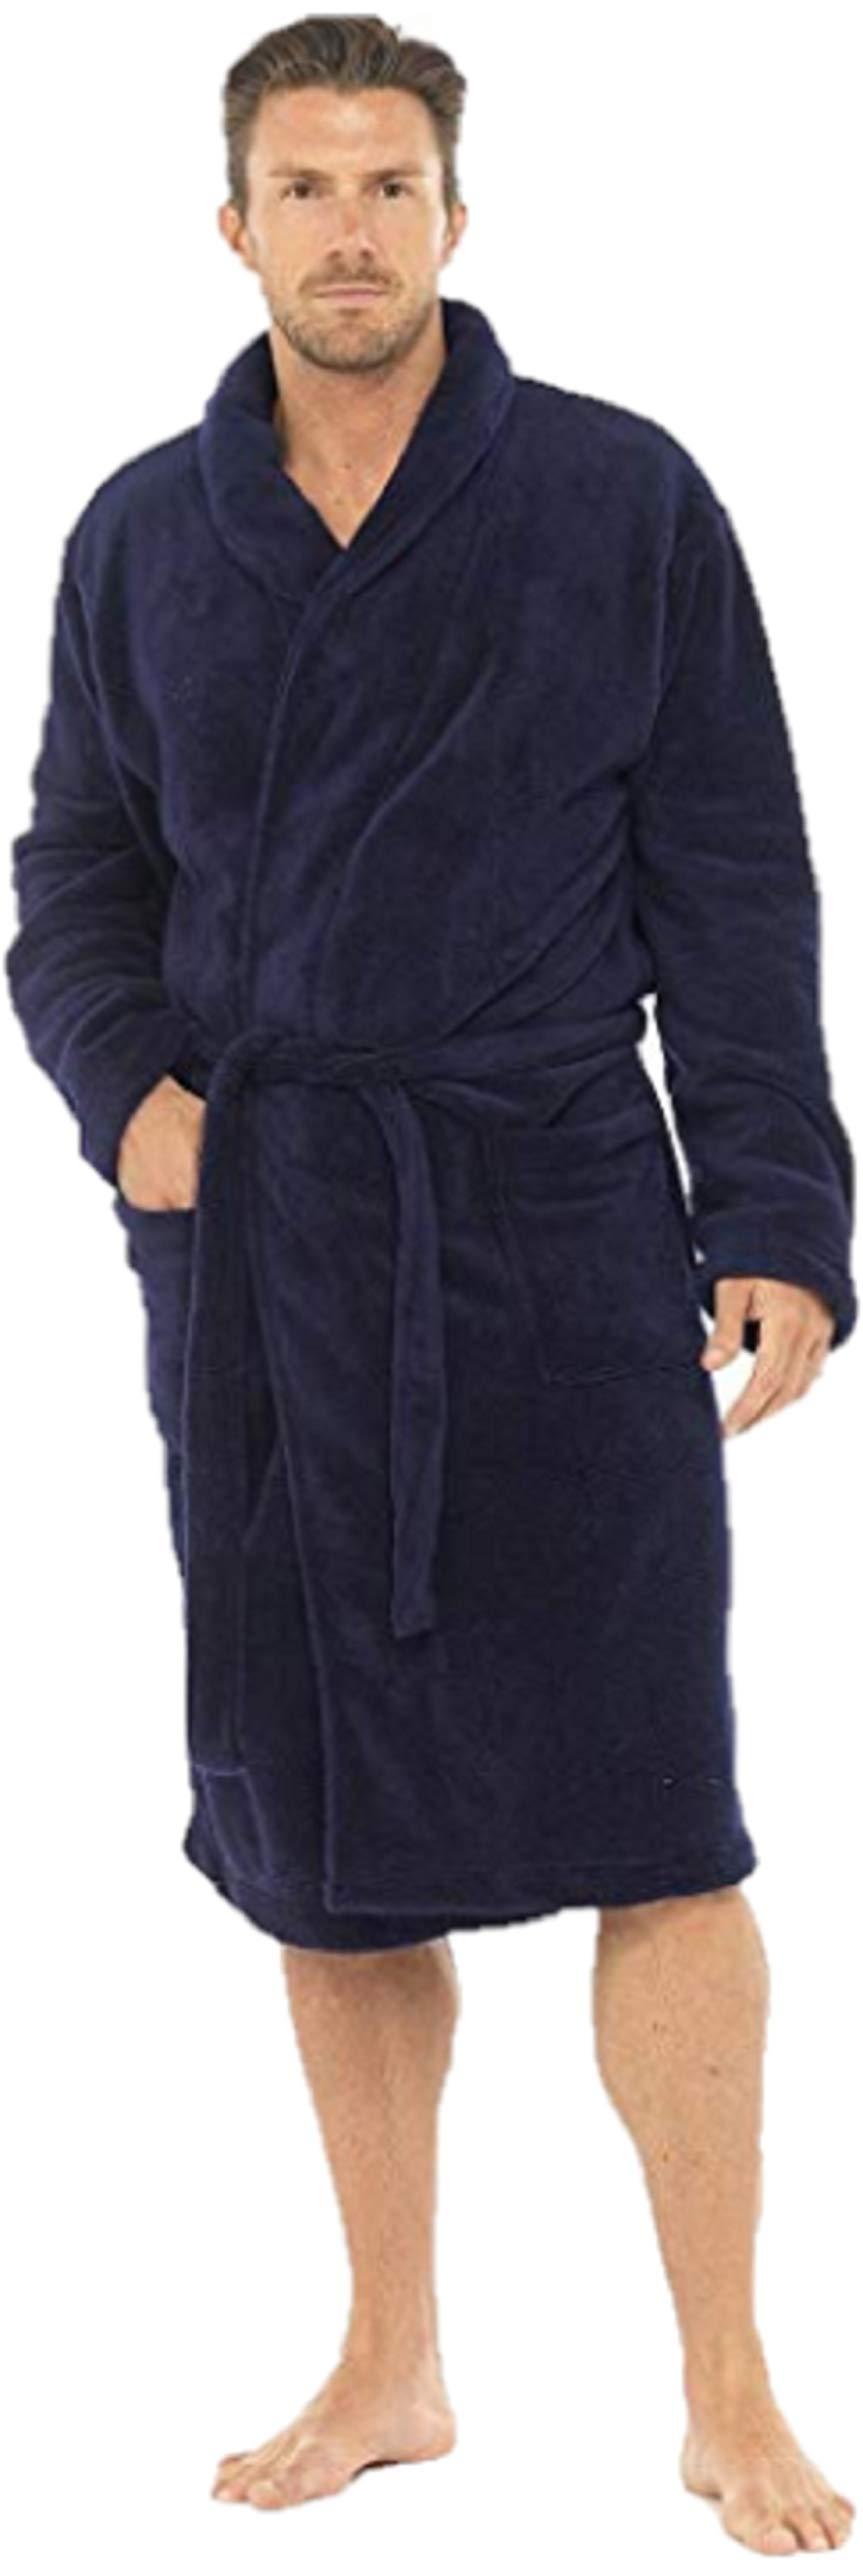 Bata de lujo de Michael Paul para hombre, de suave forro polar product image